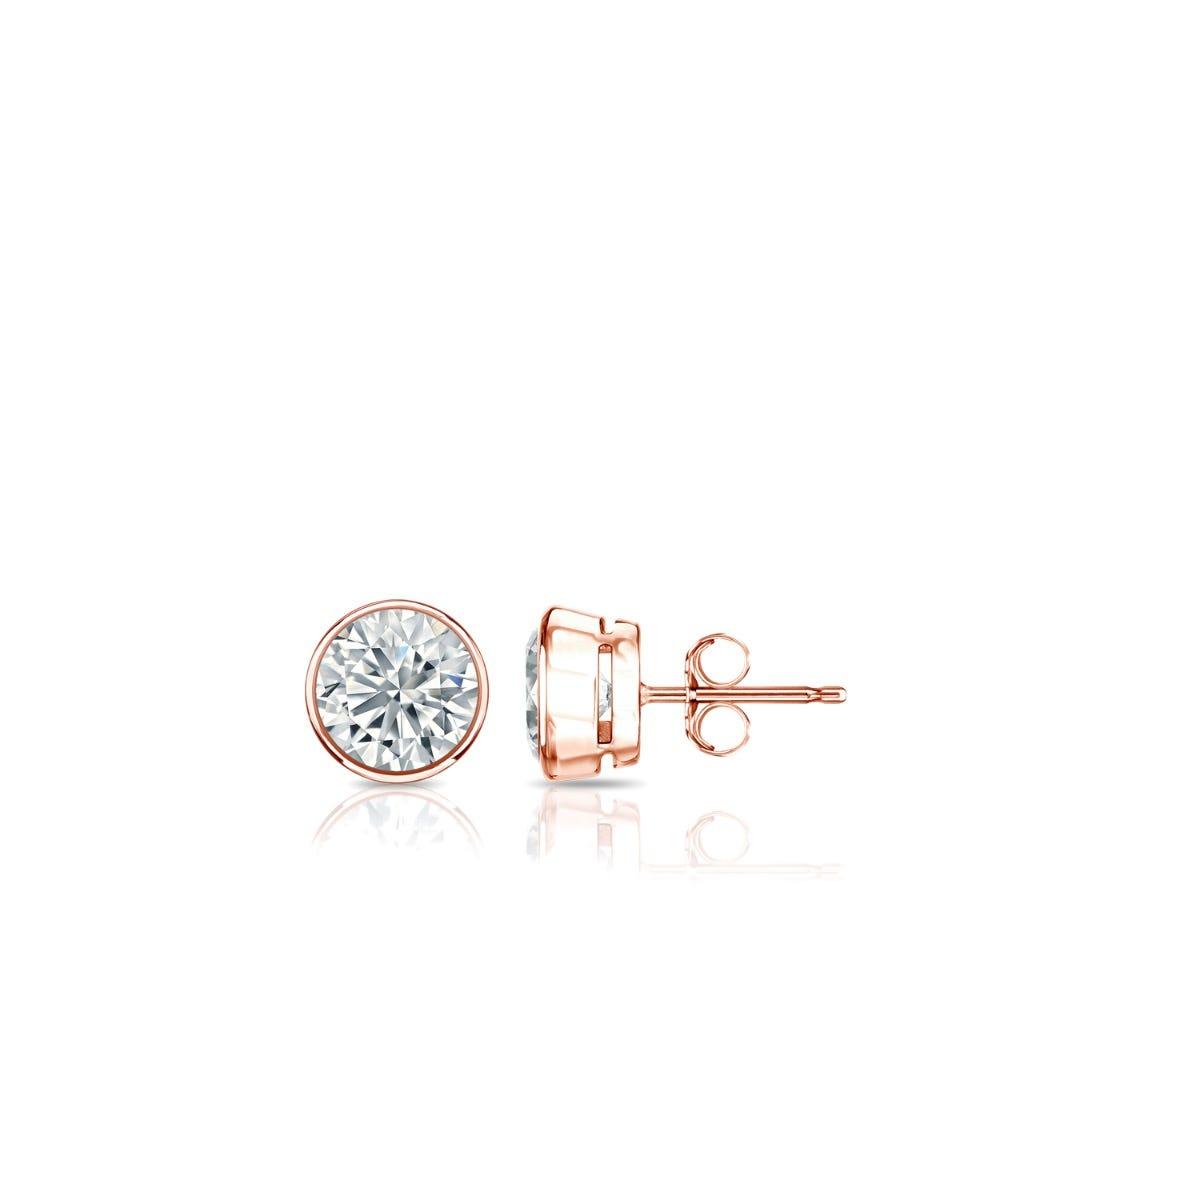 Diamond Round Bezel-Set 1/10ctw. Solitaire Stud (IJ-I1) Earrings in 14K Rose Gold